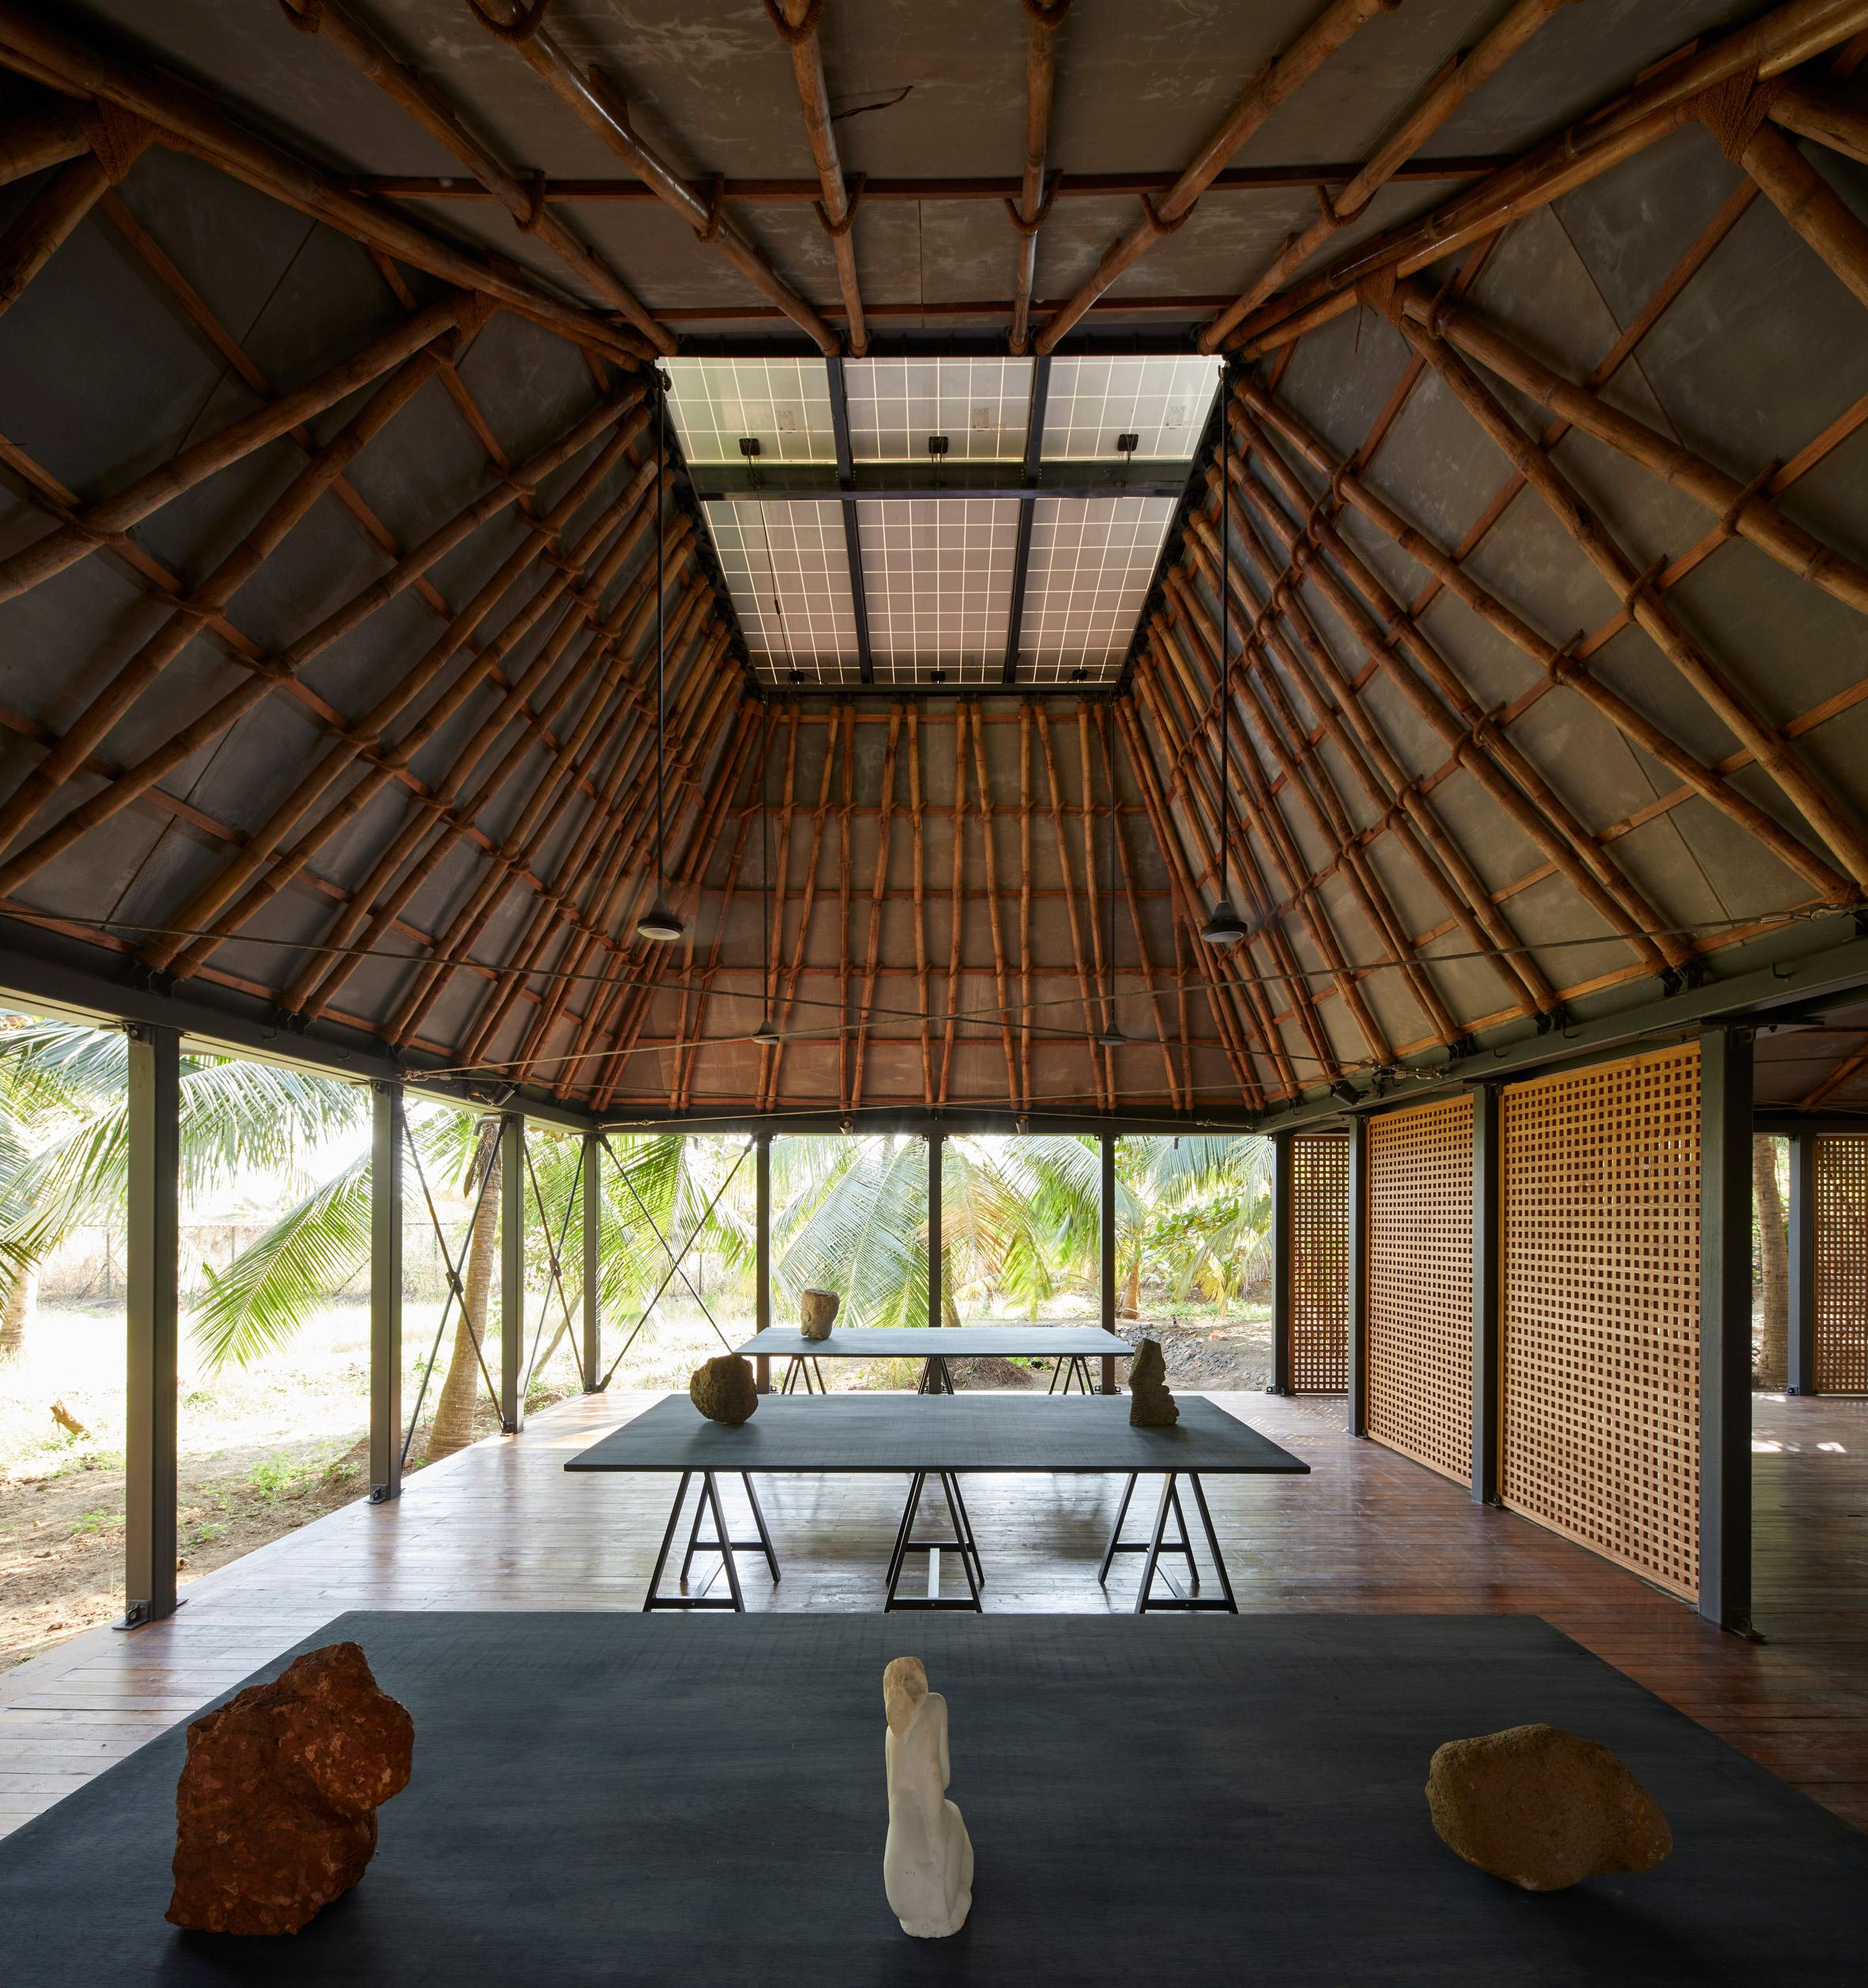 Mumbai Artists Retreat by Architecture Brio